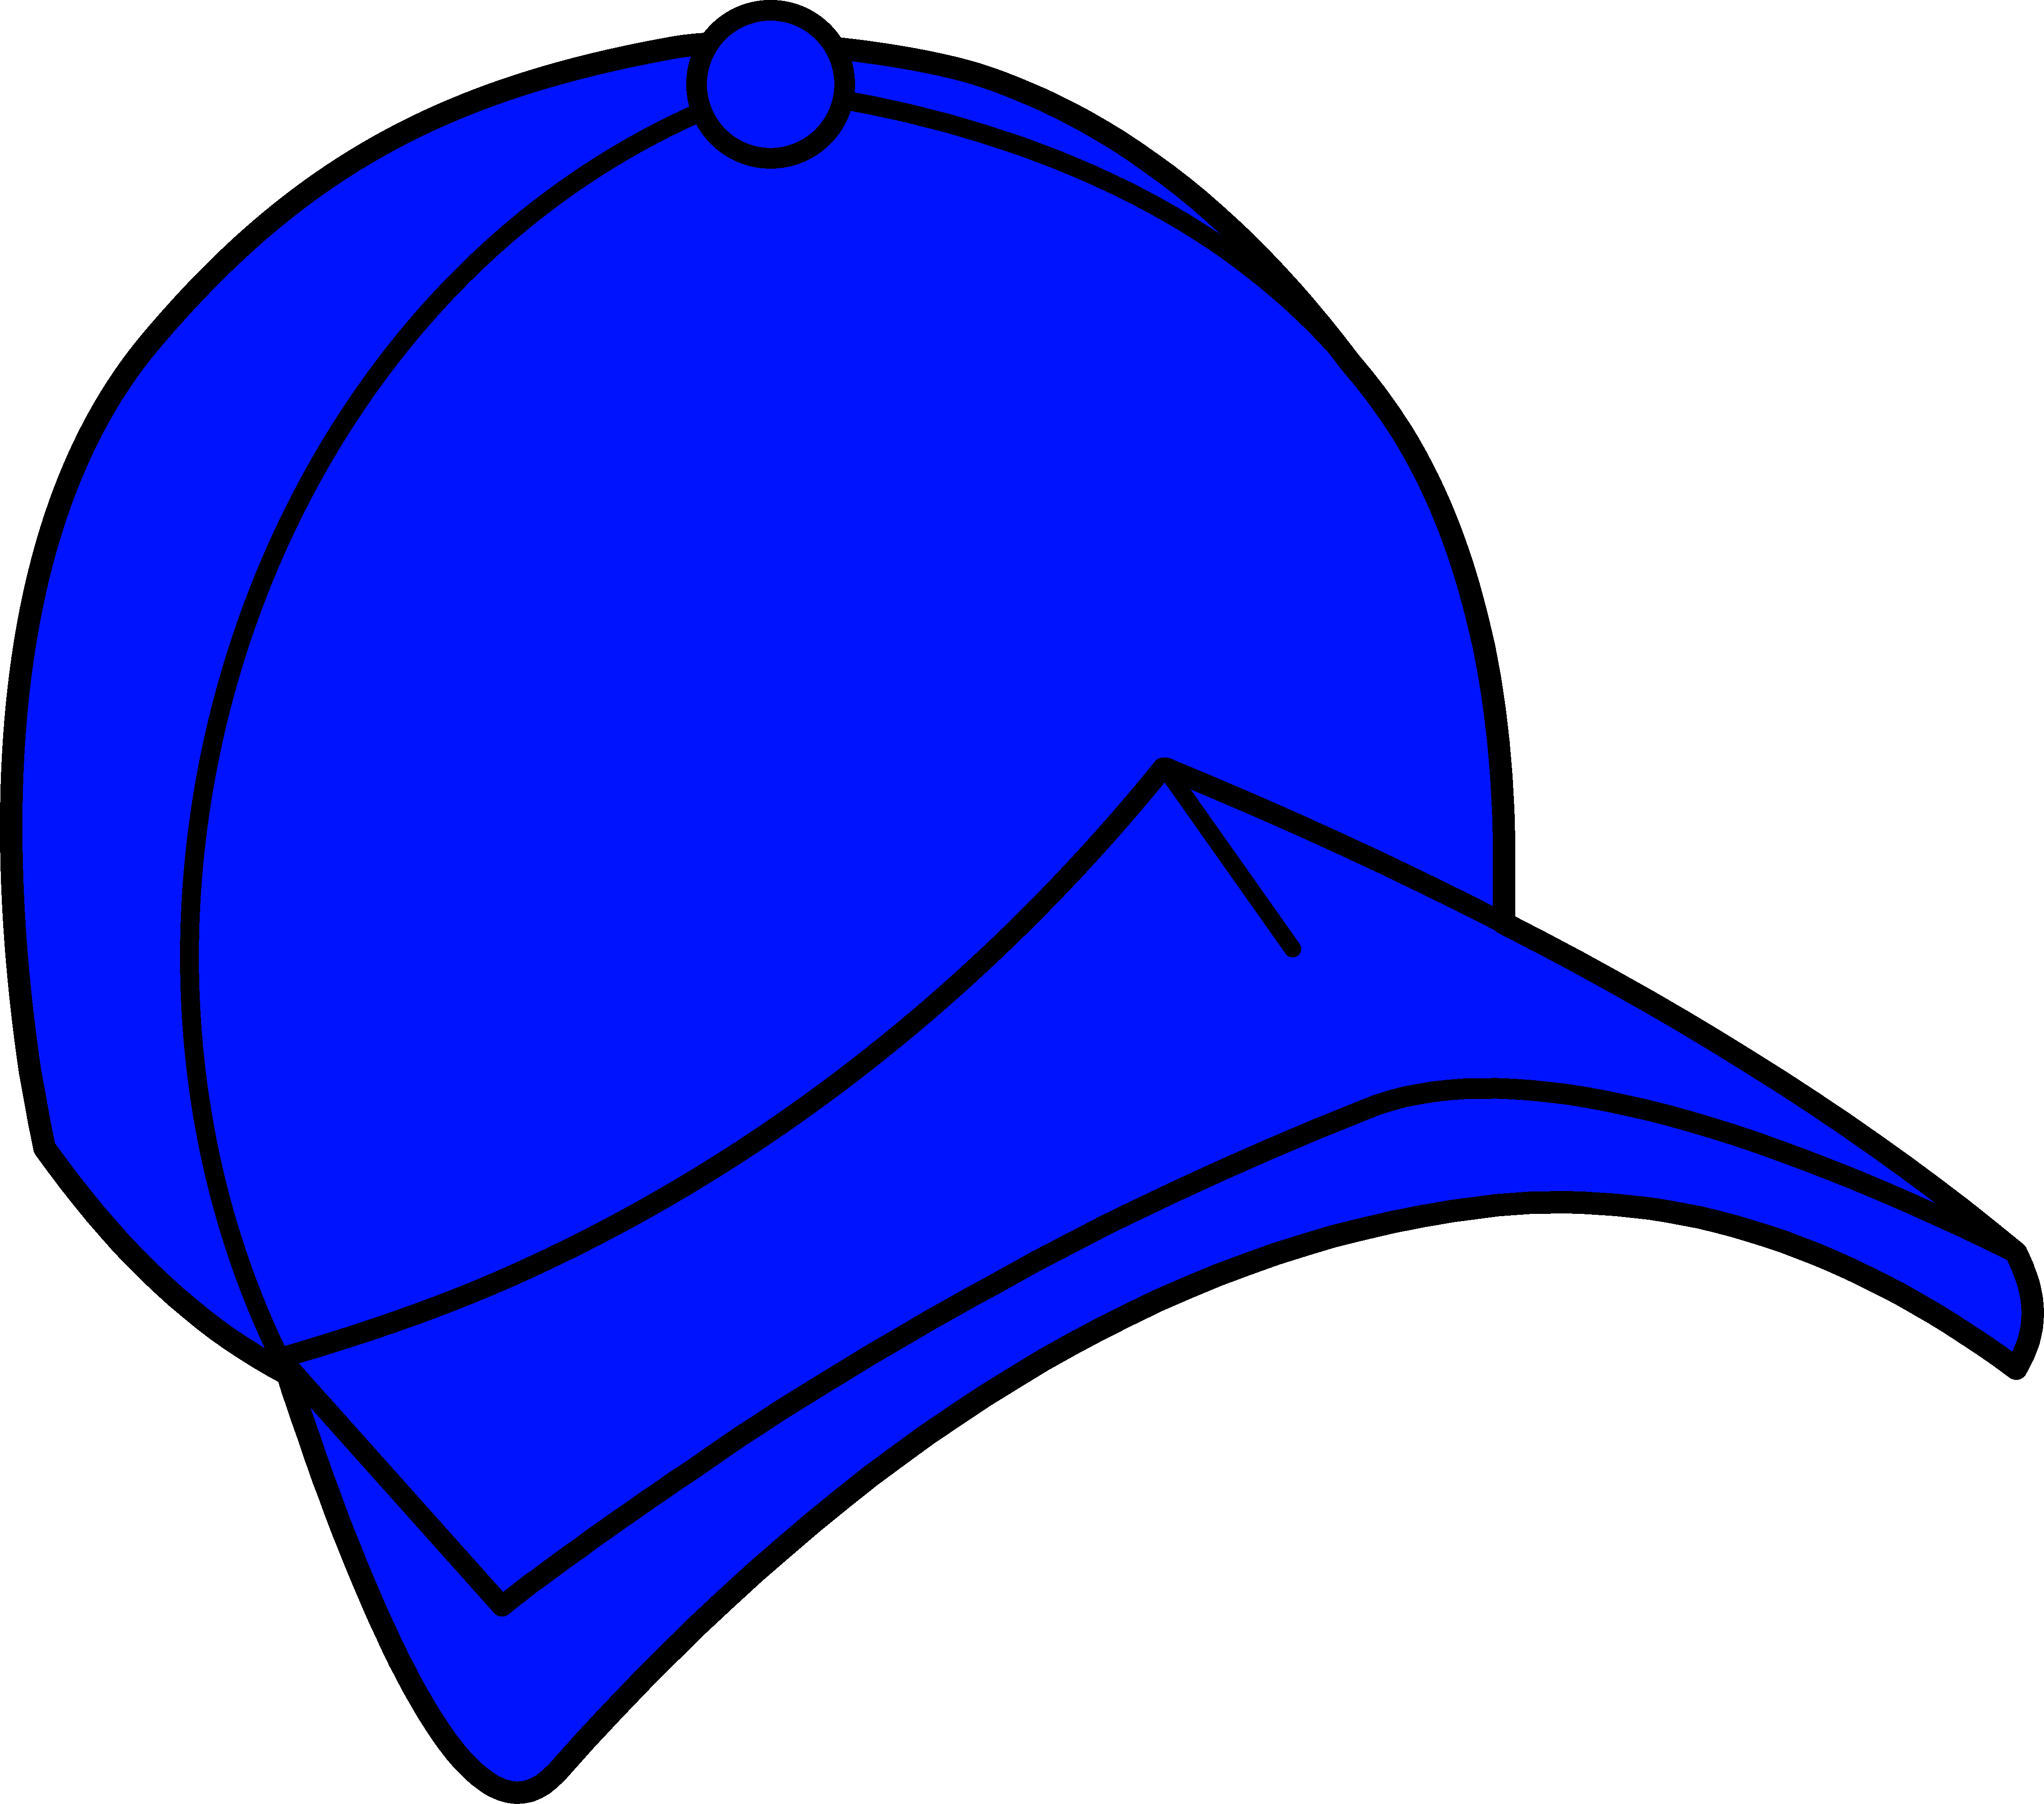 Blue%20Clip%20Art